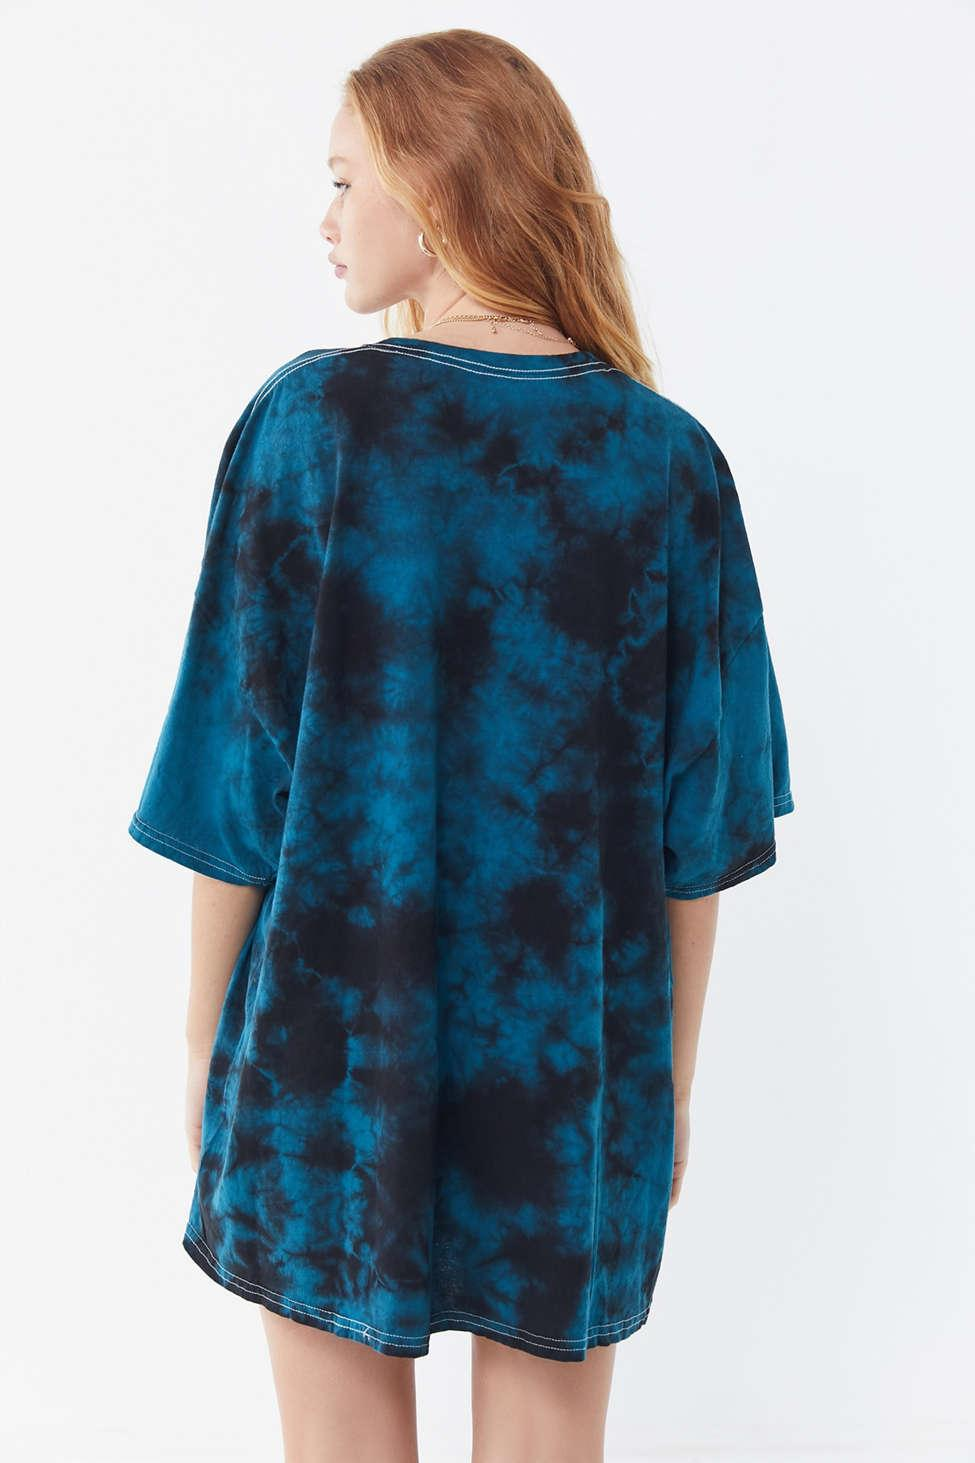 cb949e52fb11e Urban Outfitters Def Leppard Tie-dye T-shirt Dress in Blue - Lyst